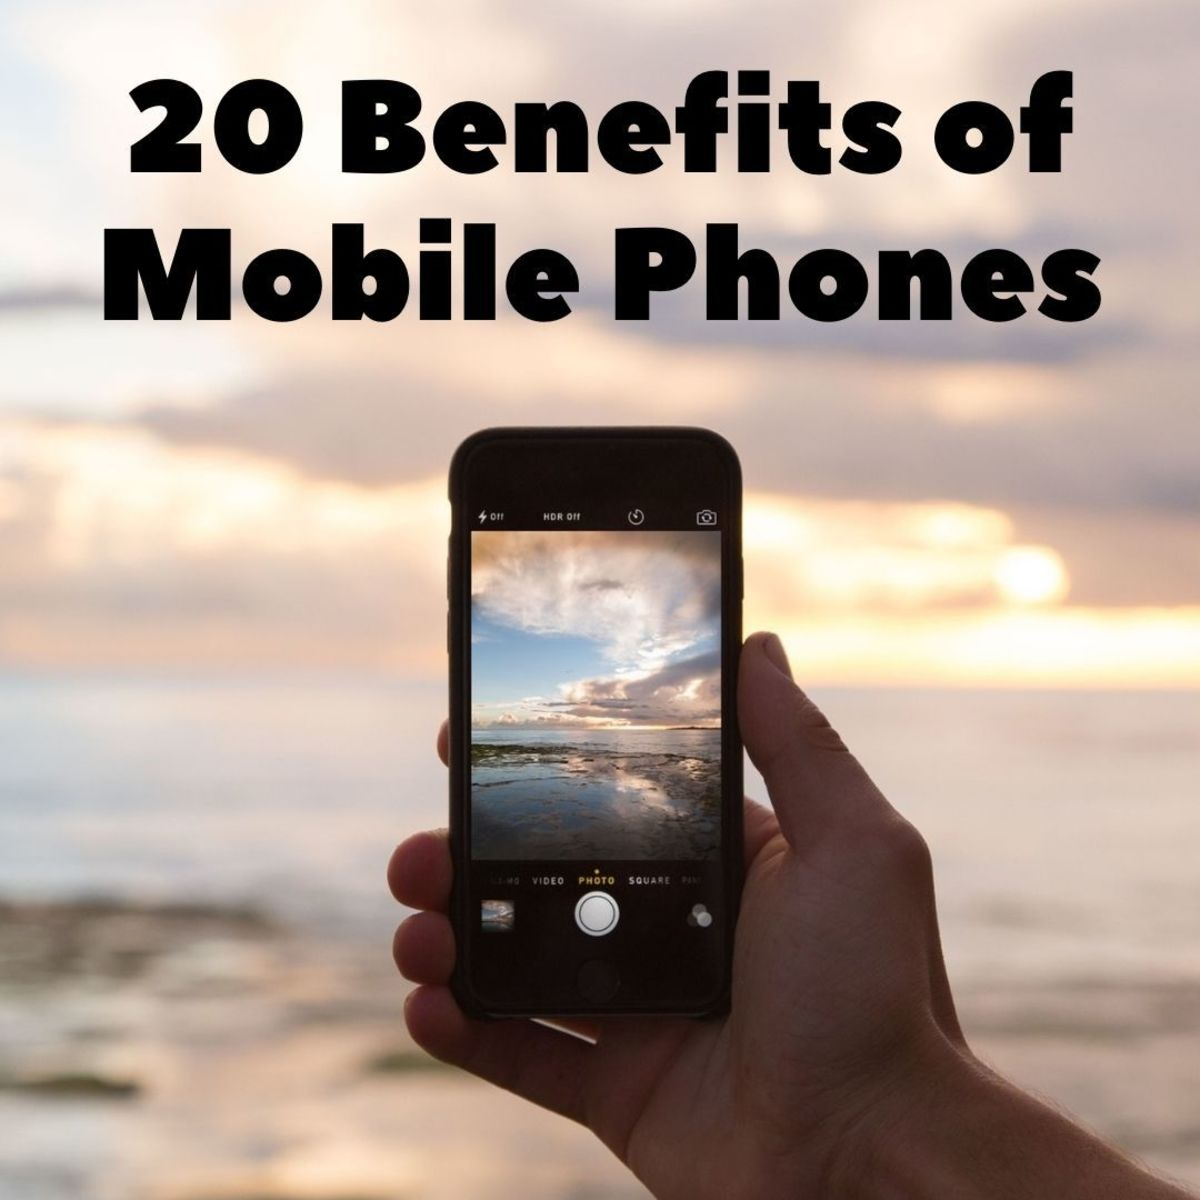 20 Advantages of Mobile Phones